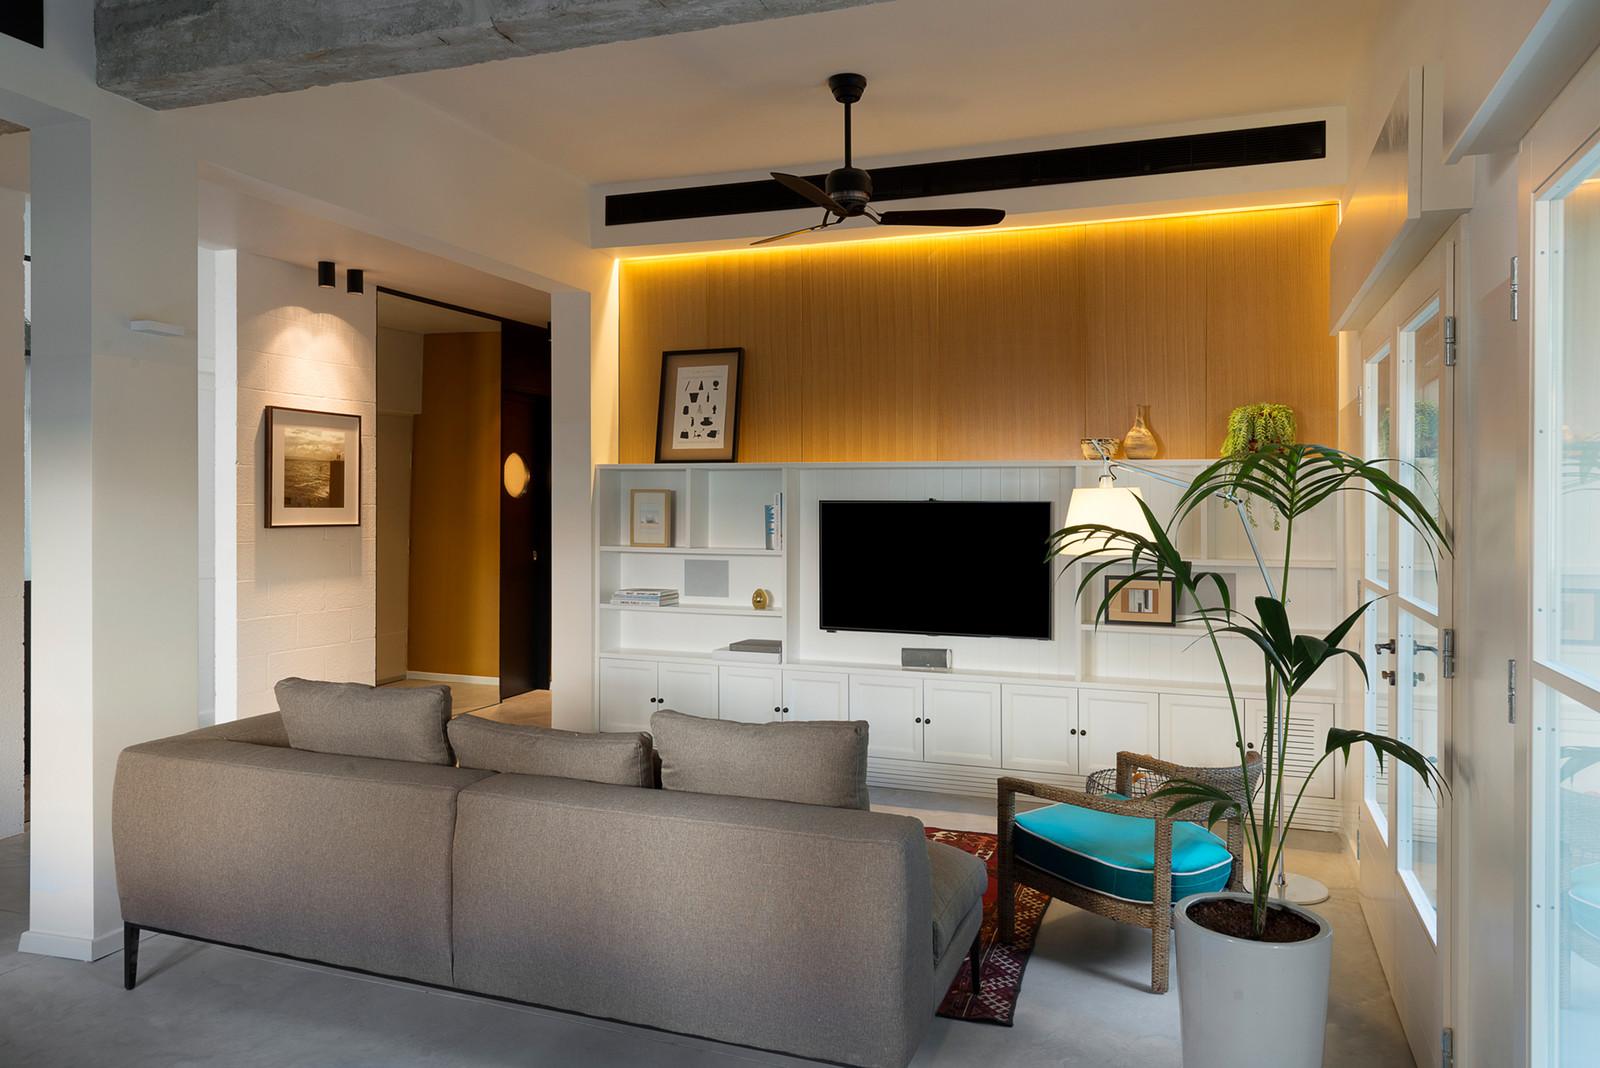 Apartment-renovation-just3ds.com-4